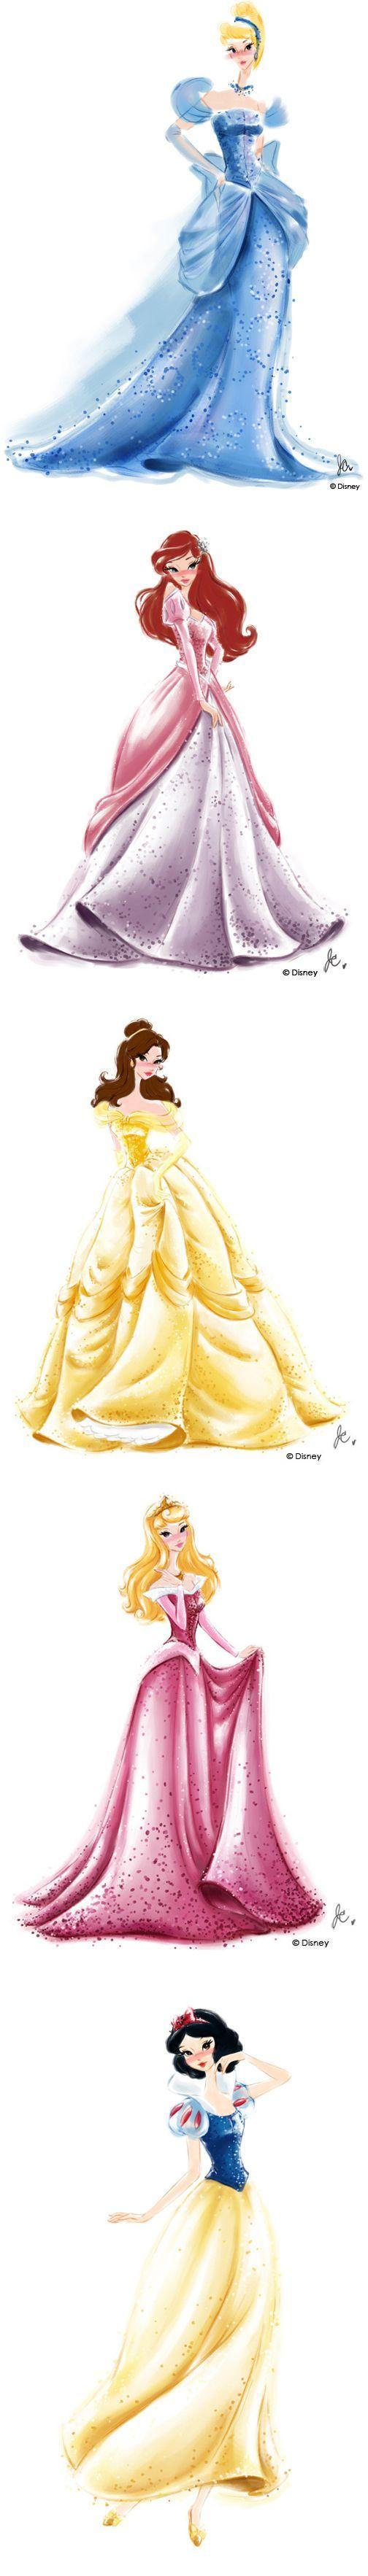 Disney Princess Watercolors by Jenny Chung